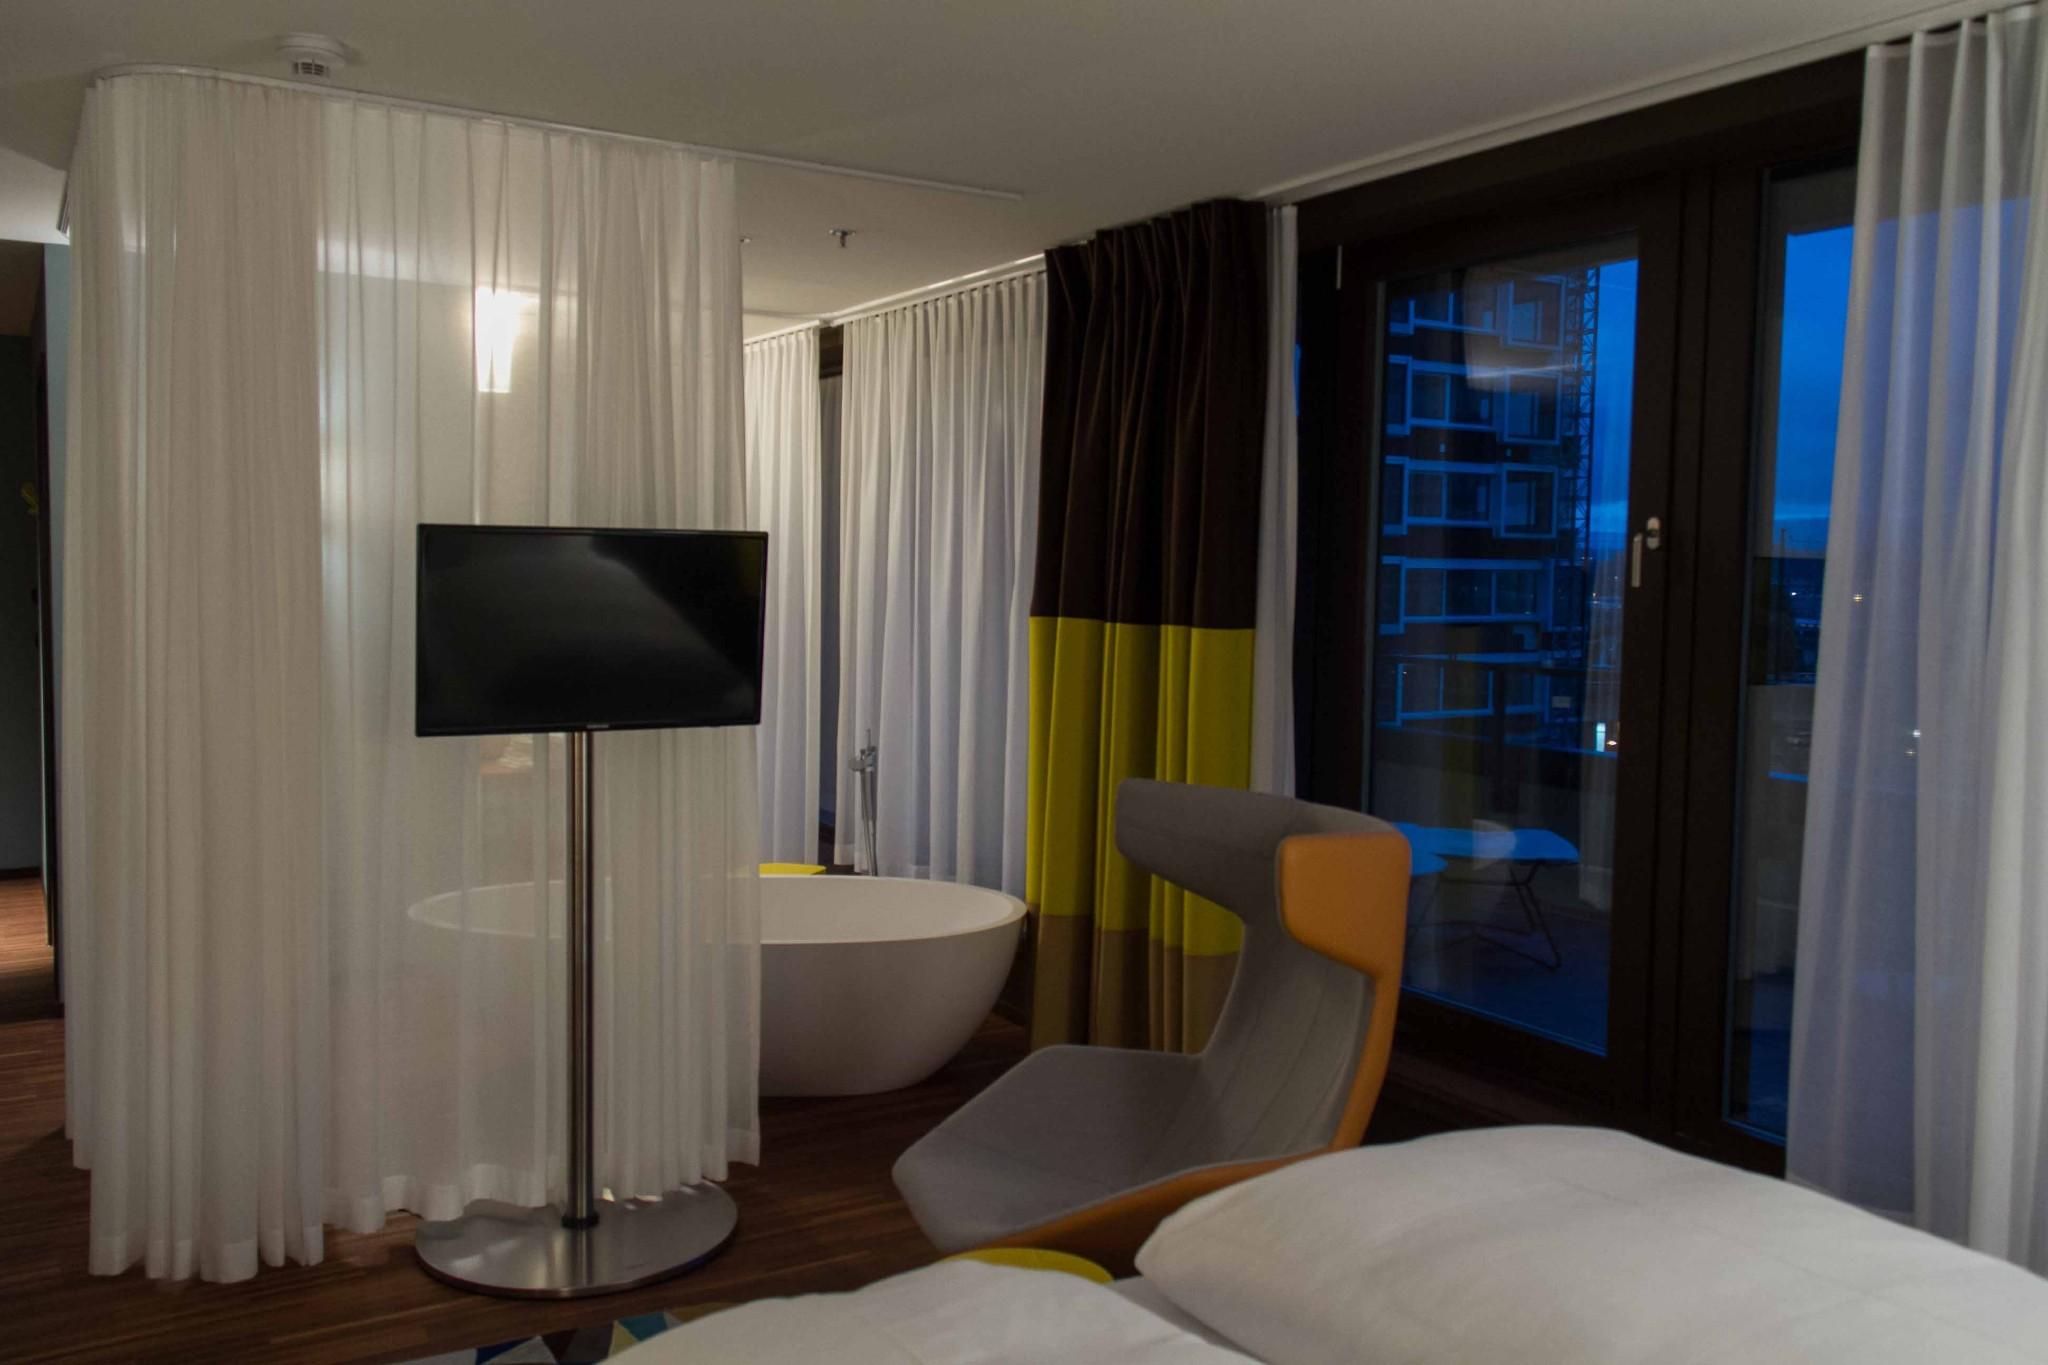 File:Haeberli Suite mit TV und Badezimmer - panoramio.jpg ...